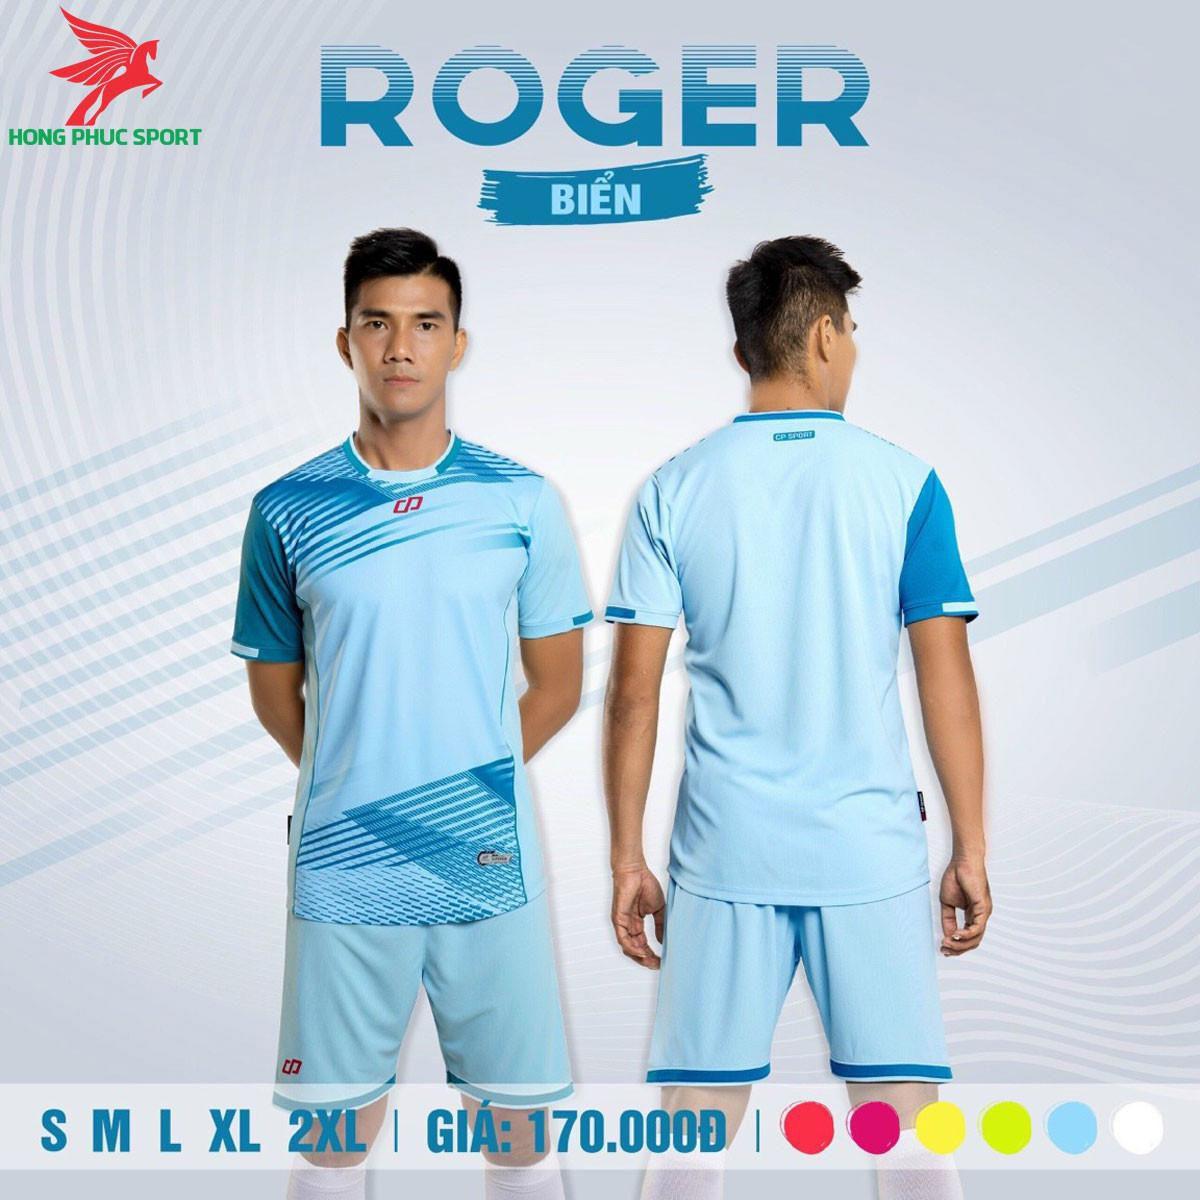 https://cdn.hongphucsport.com/unsafe/s4.shopbay.vn/files/285/ao-bong-da-khong-logo-cp-roger-2021-mau-xanh-bien-6052d3afebcc6.jpg